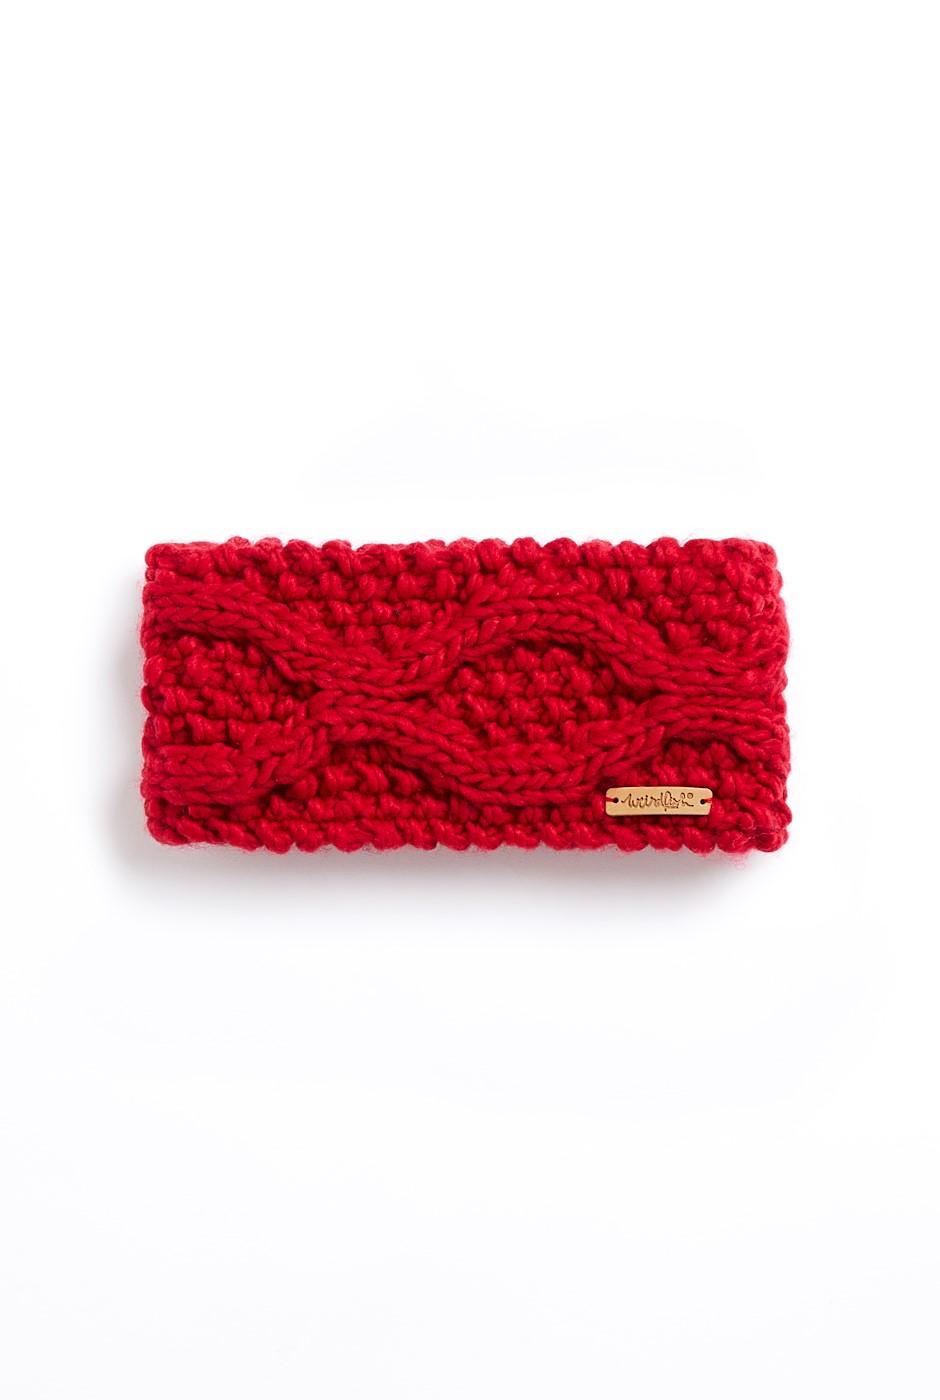 Ellor Eco Chunky Cable Knit Headband Crimson